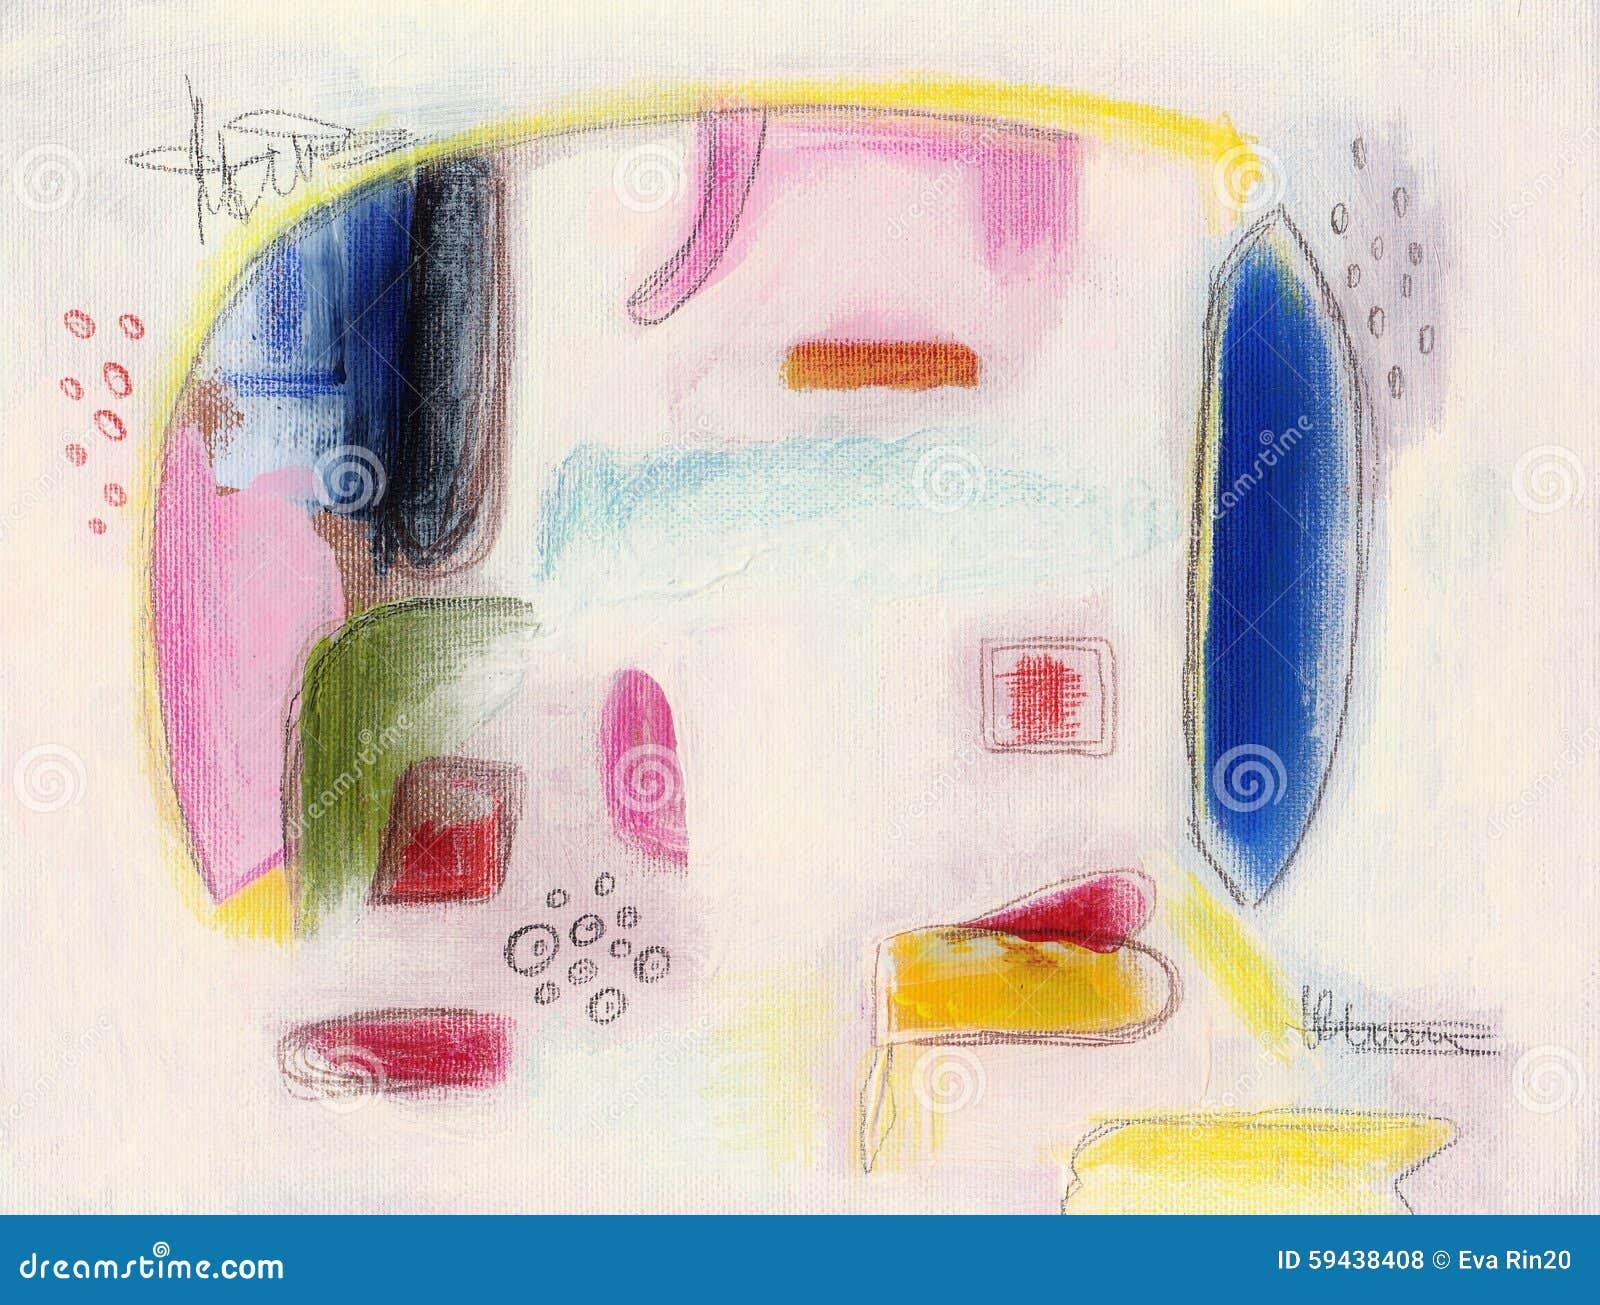 Obraz abstrakcyjne